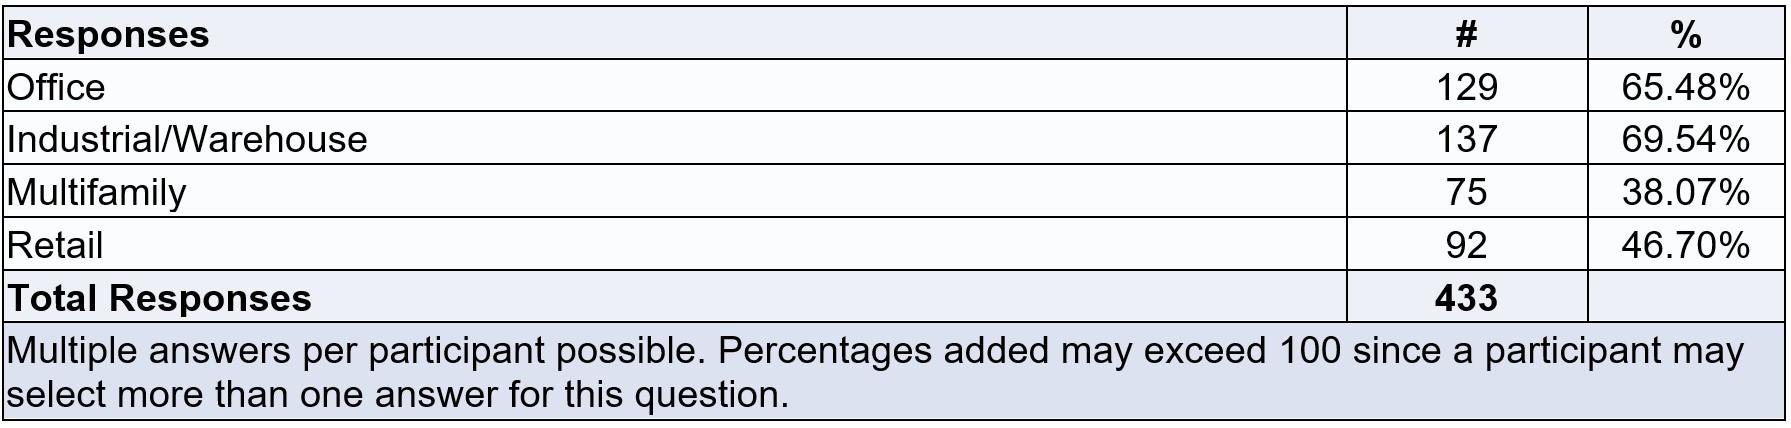 Property types chart